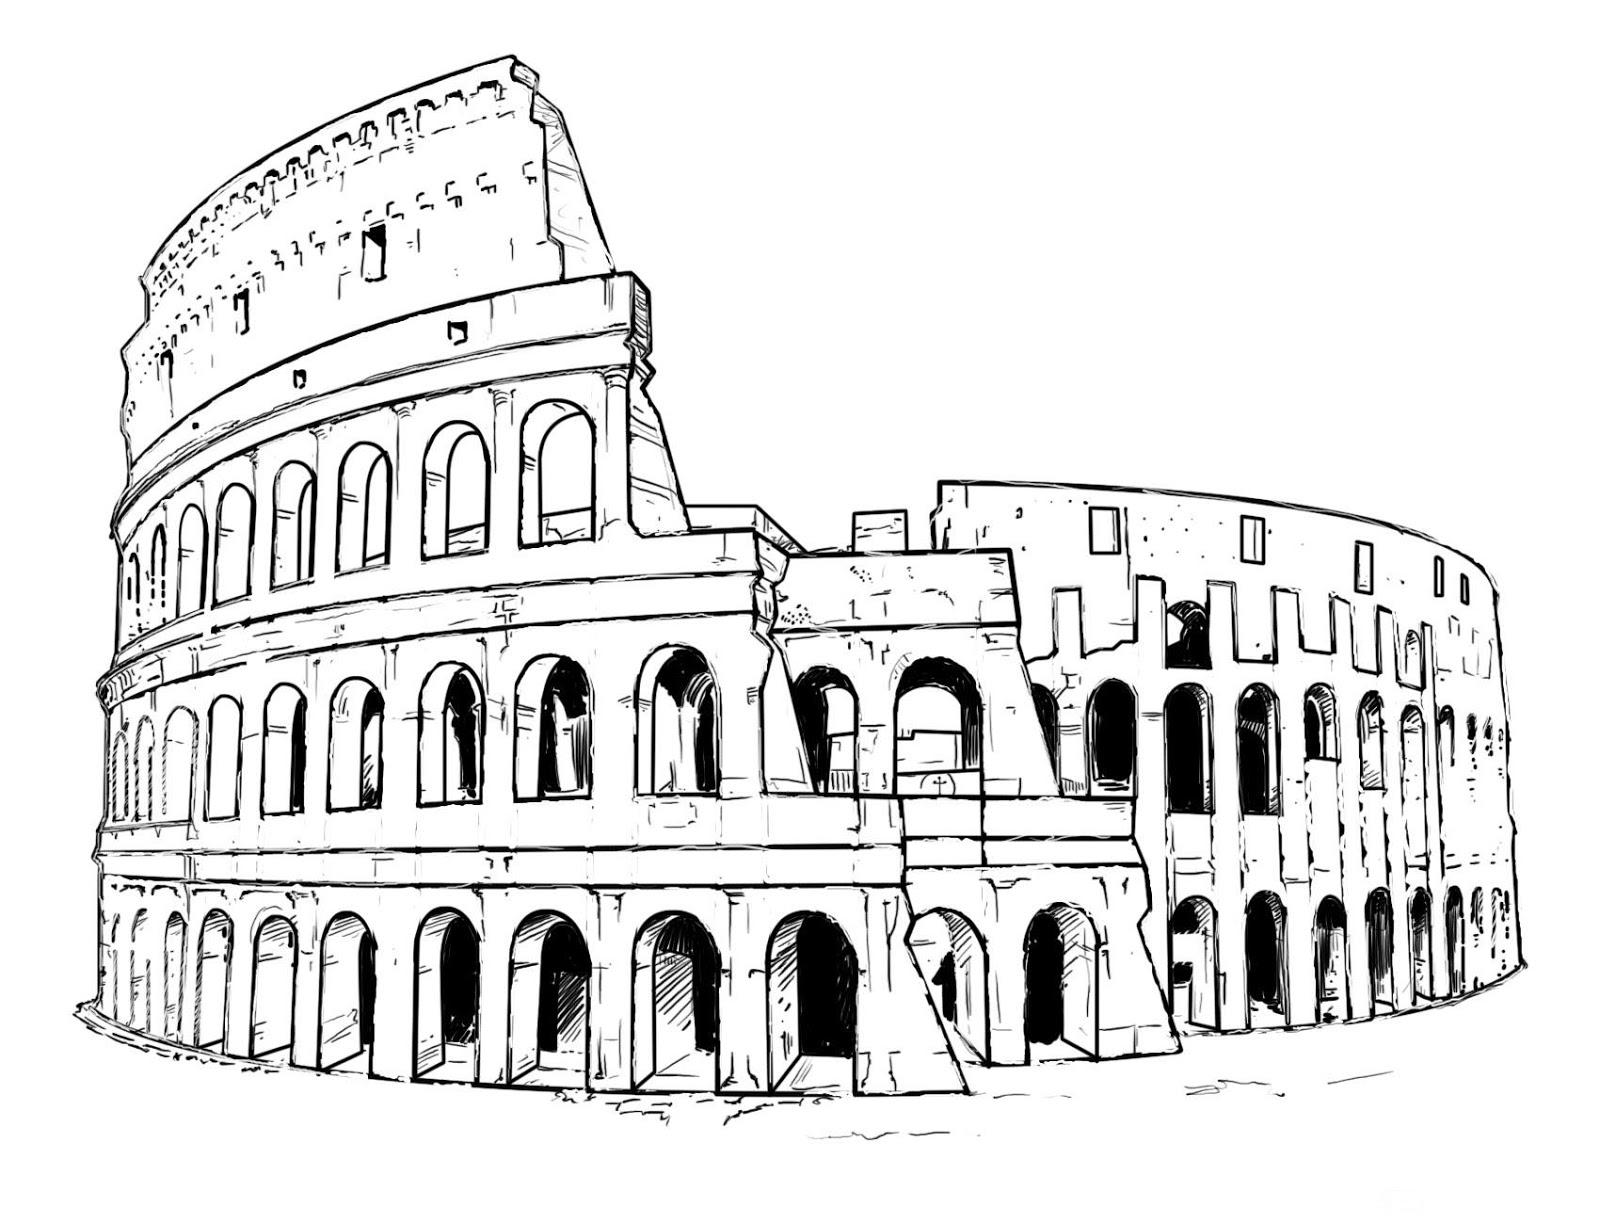 best Imagenes Del Coliseo Romano Para Imprimir image collection